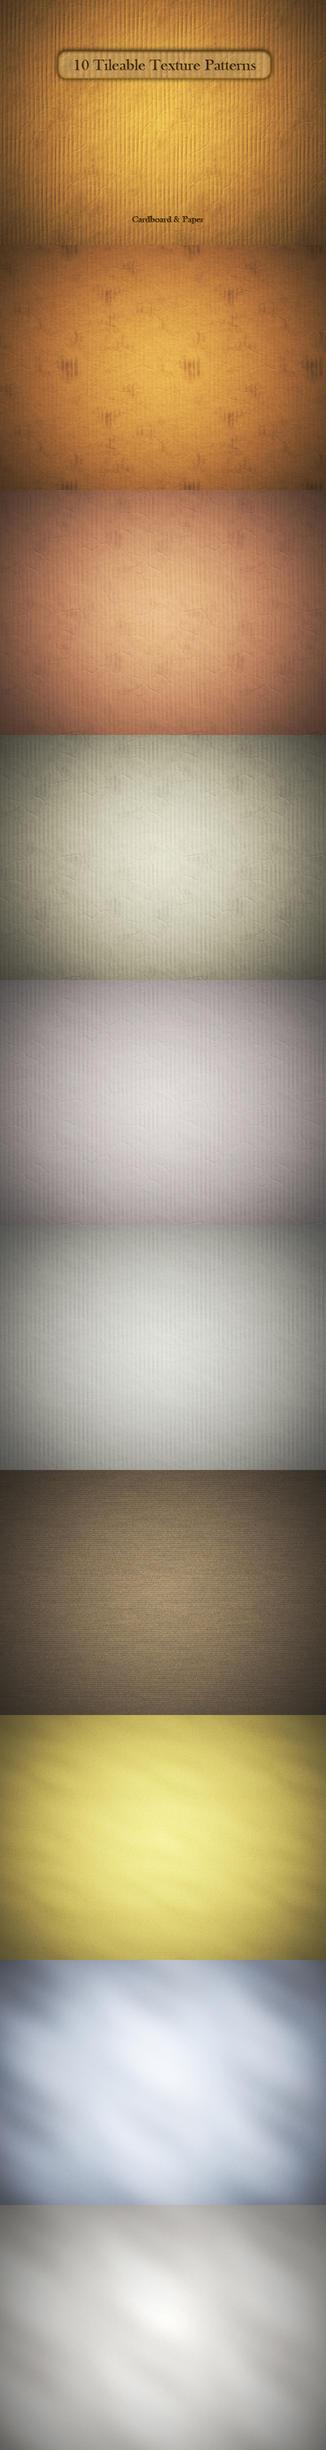 10 Cardboard Paper Textures by MuzikizumWeb